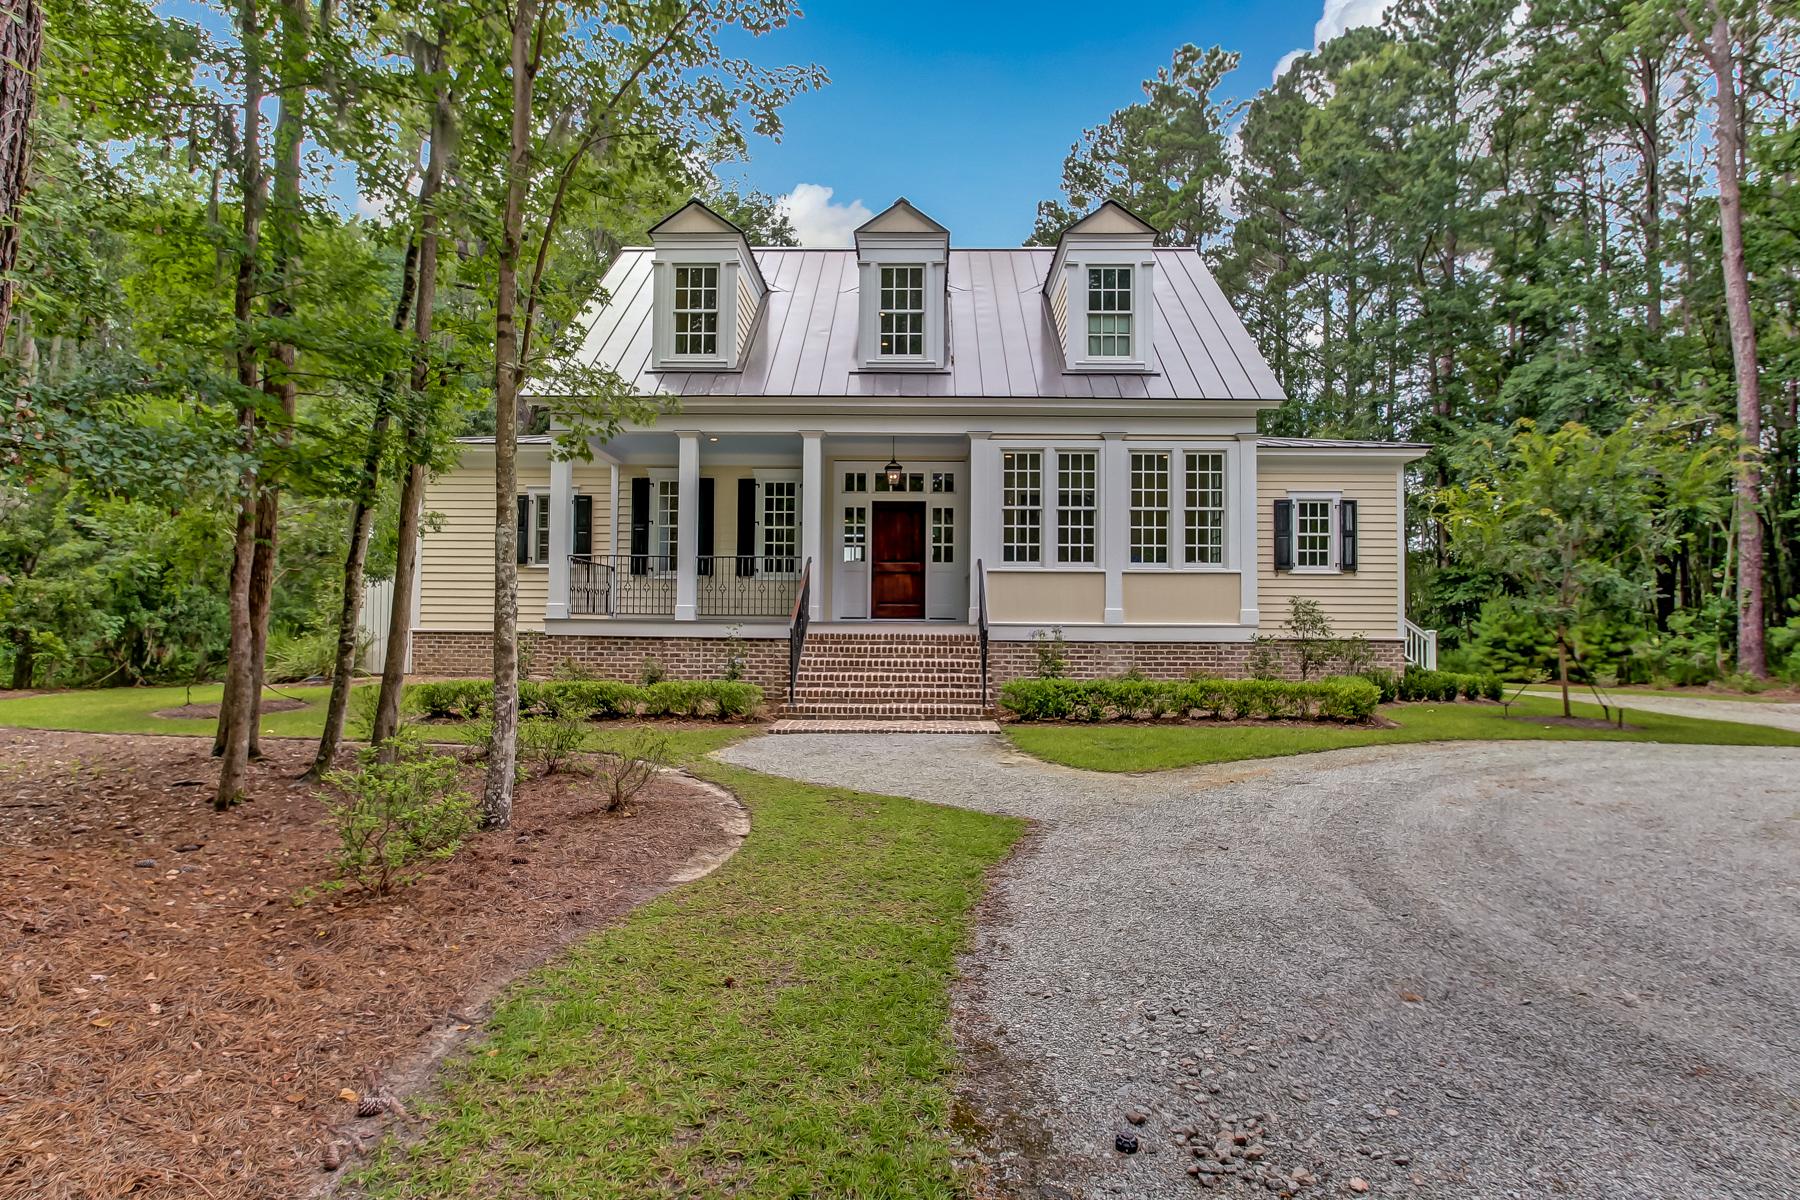 Single Family Home for Sale at 1105 Dublin Drive Richmond Hill, Georgia, 31324 United States